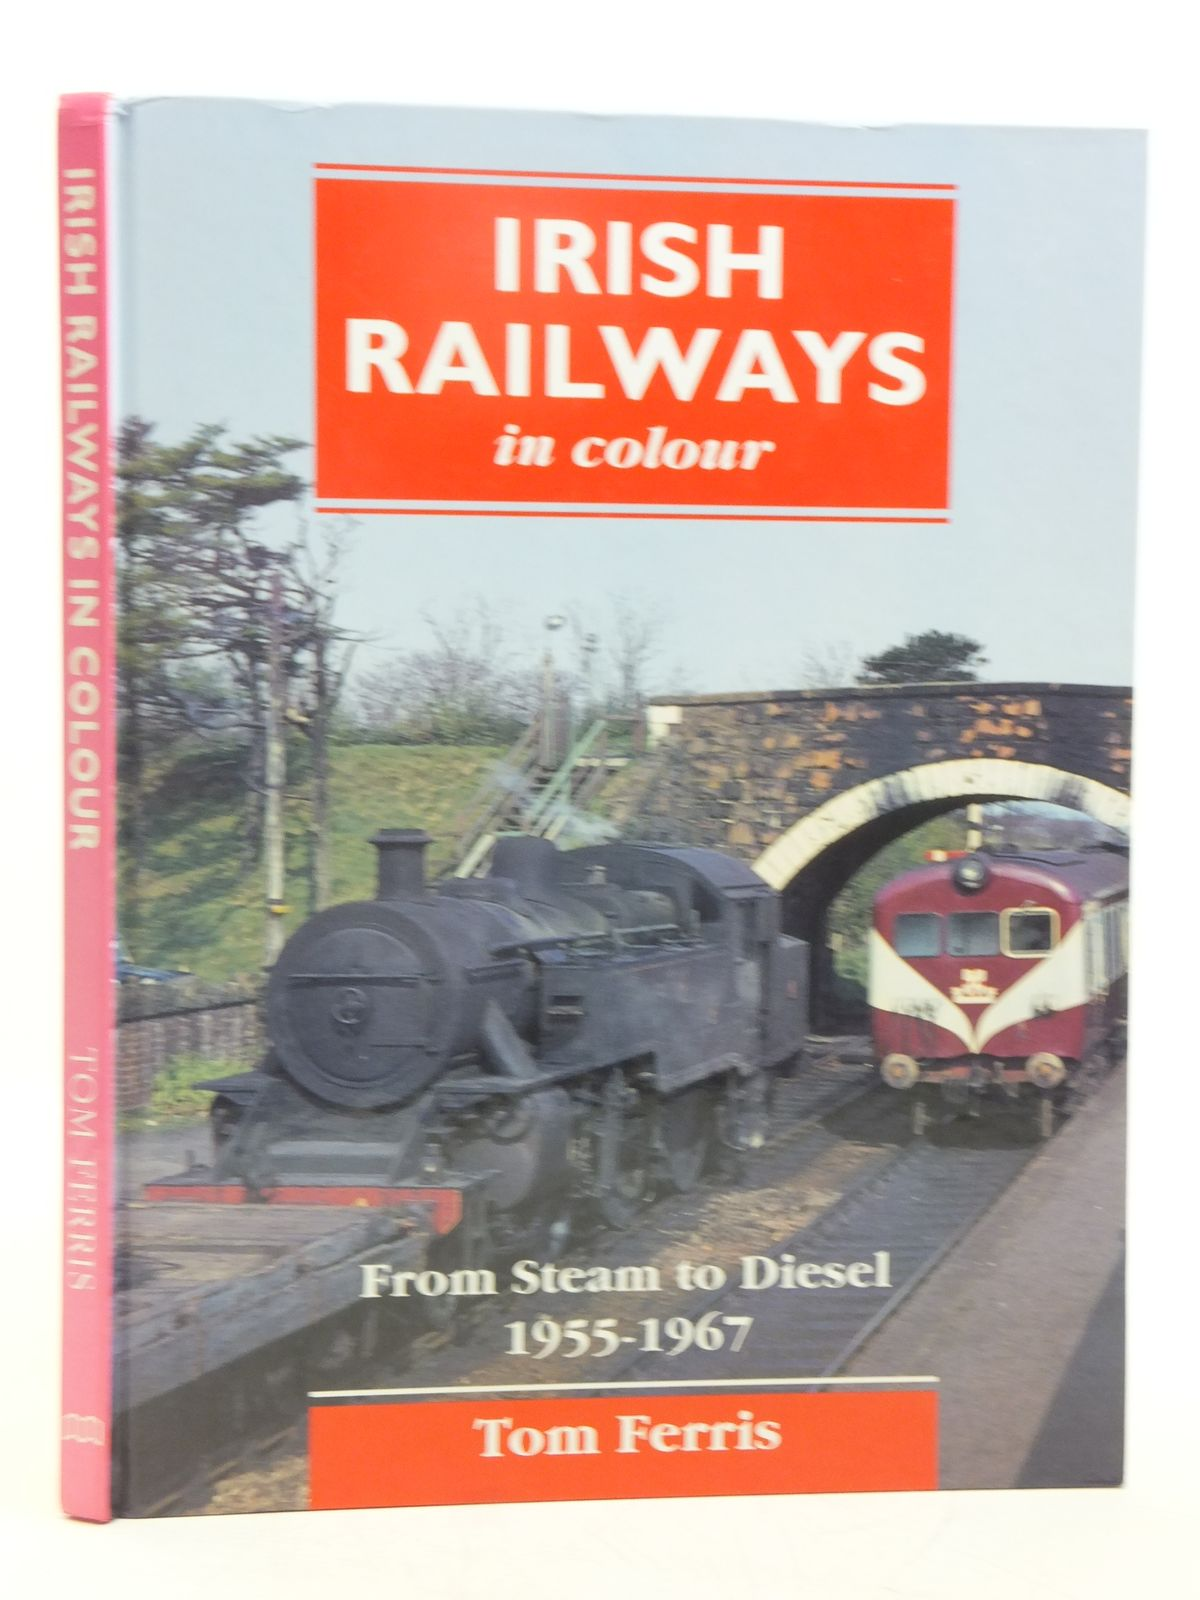 Photo of IRISH RAILWAYS IN COLOUR FROM STEAM TO DIESEL 1955-1967